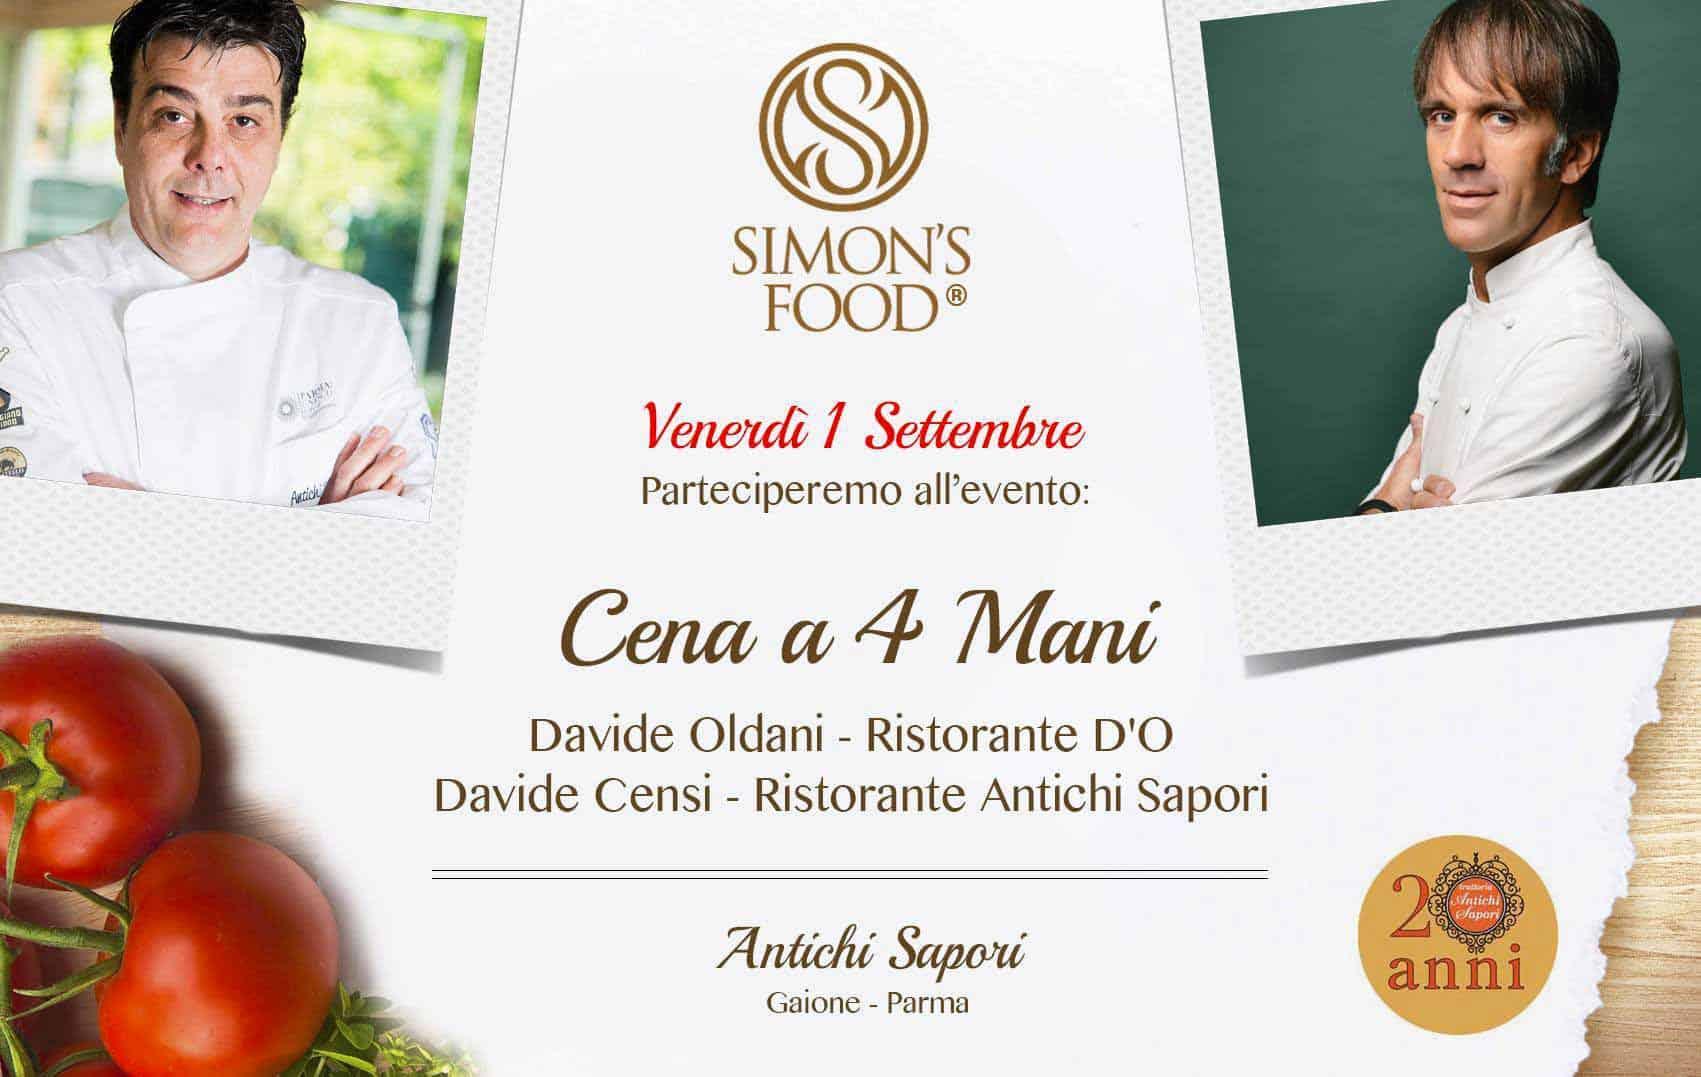 Cena a 4 mani, Antichi Sapori, Parma